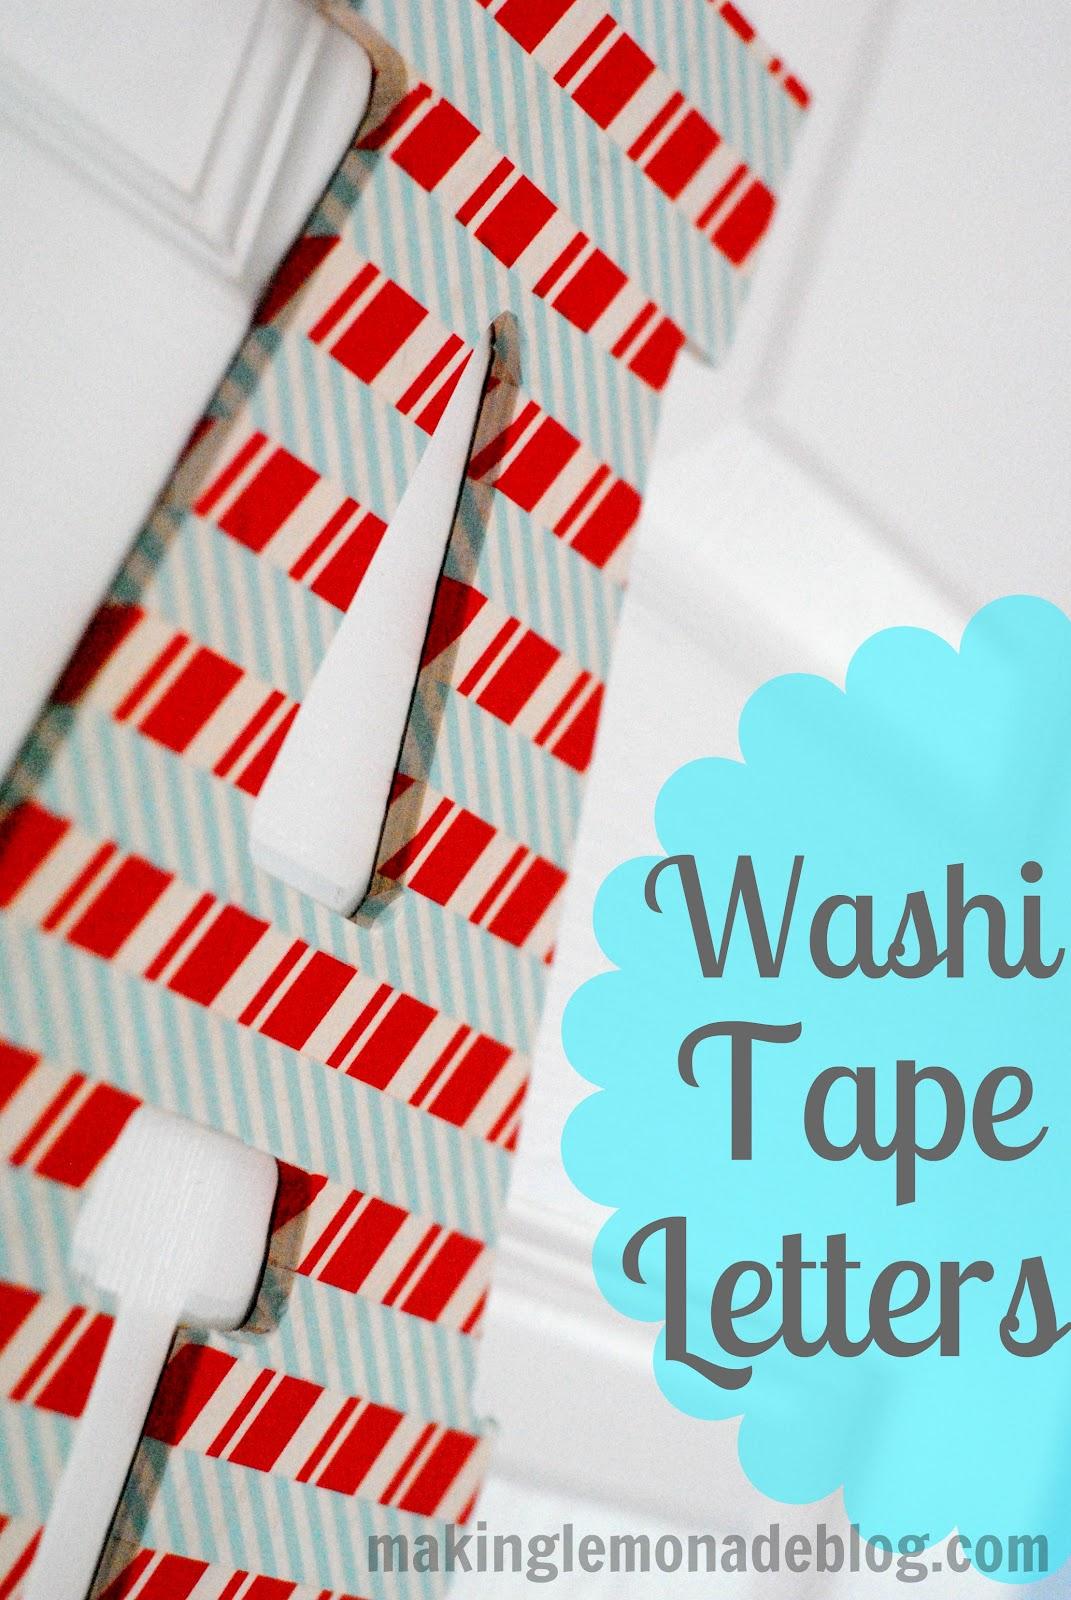 washi tape wooden letter kids craft idea